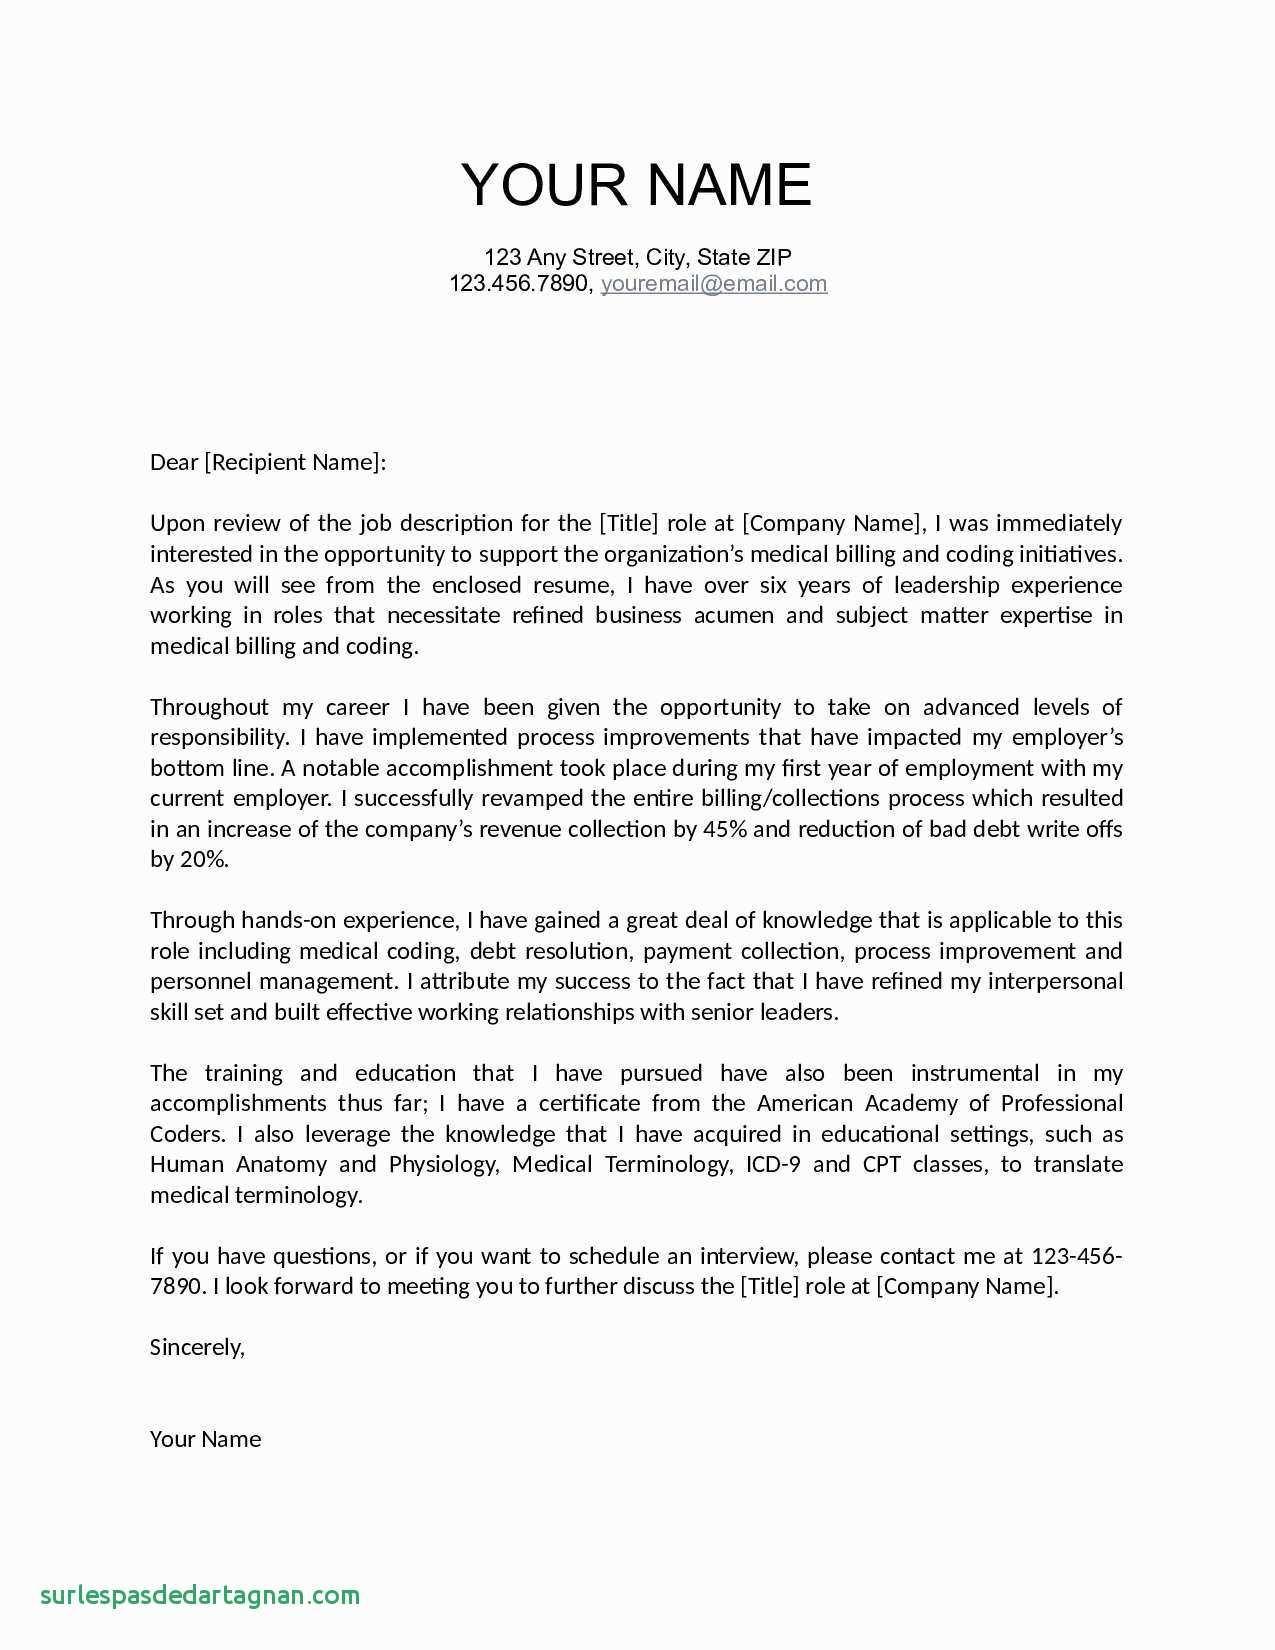 Cover Letter Template Australia - Resume Writing Group Reviews Unique Fresh Job Fer Letter Template Us